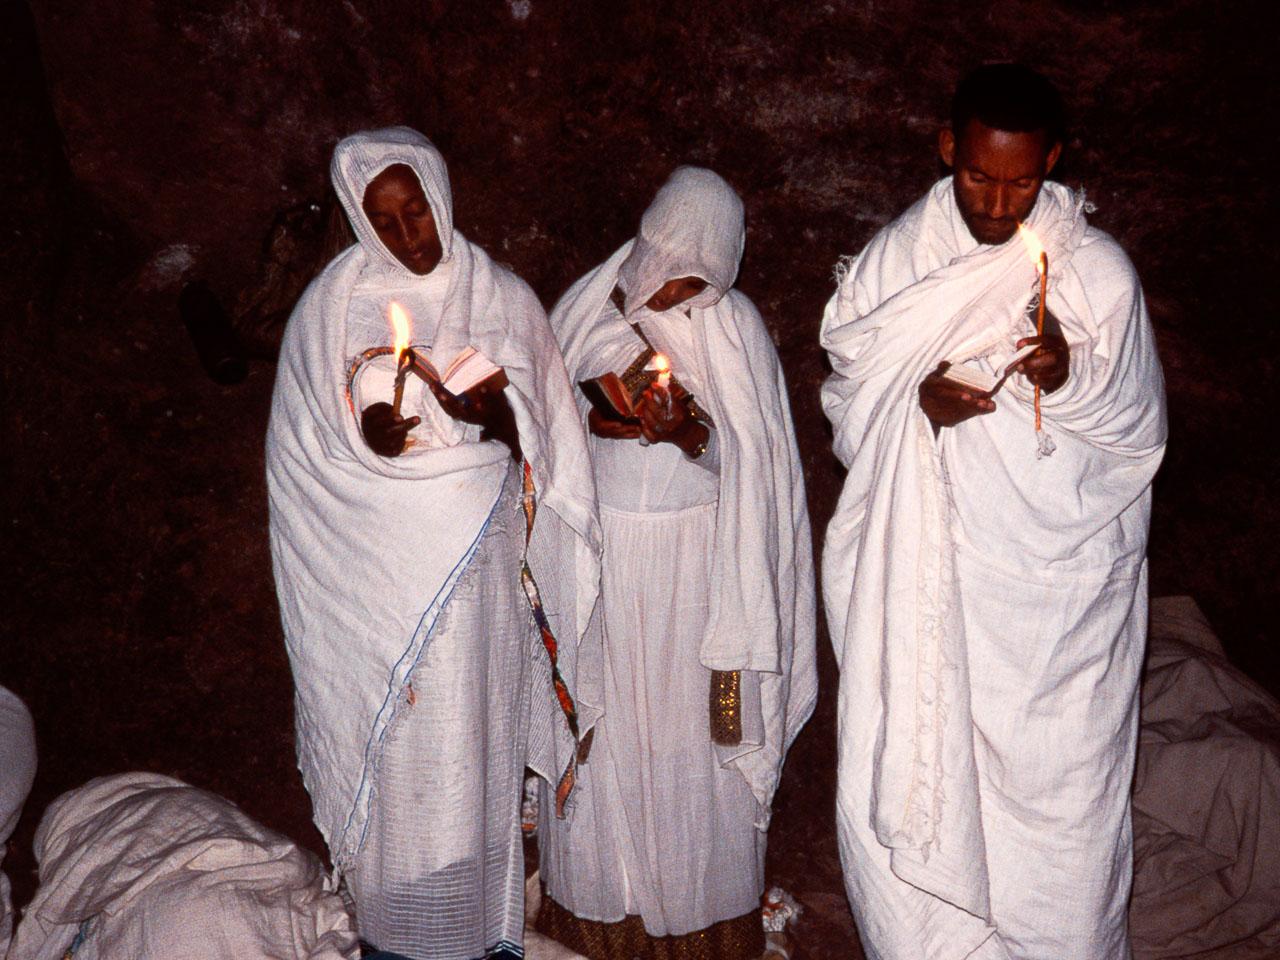 ET05009-Lalibela-Pilgrims-with-candles-at-Leddet.jpg